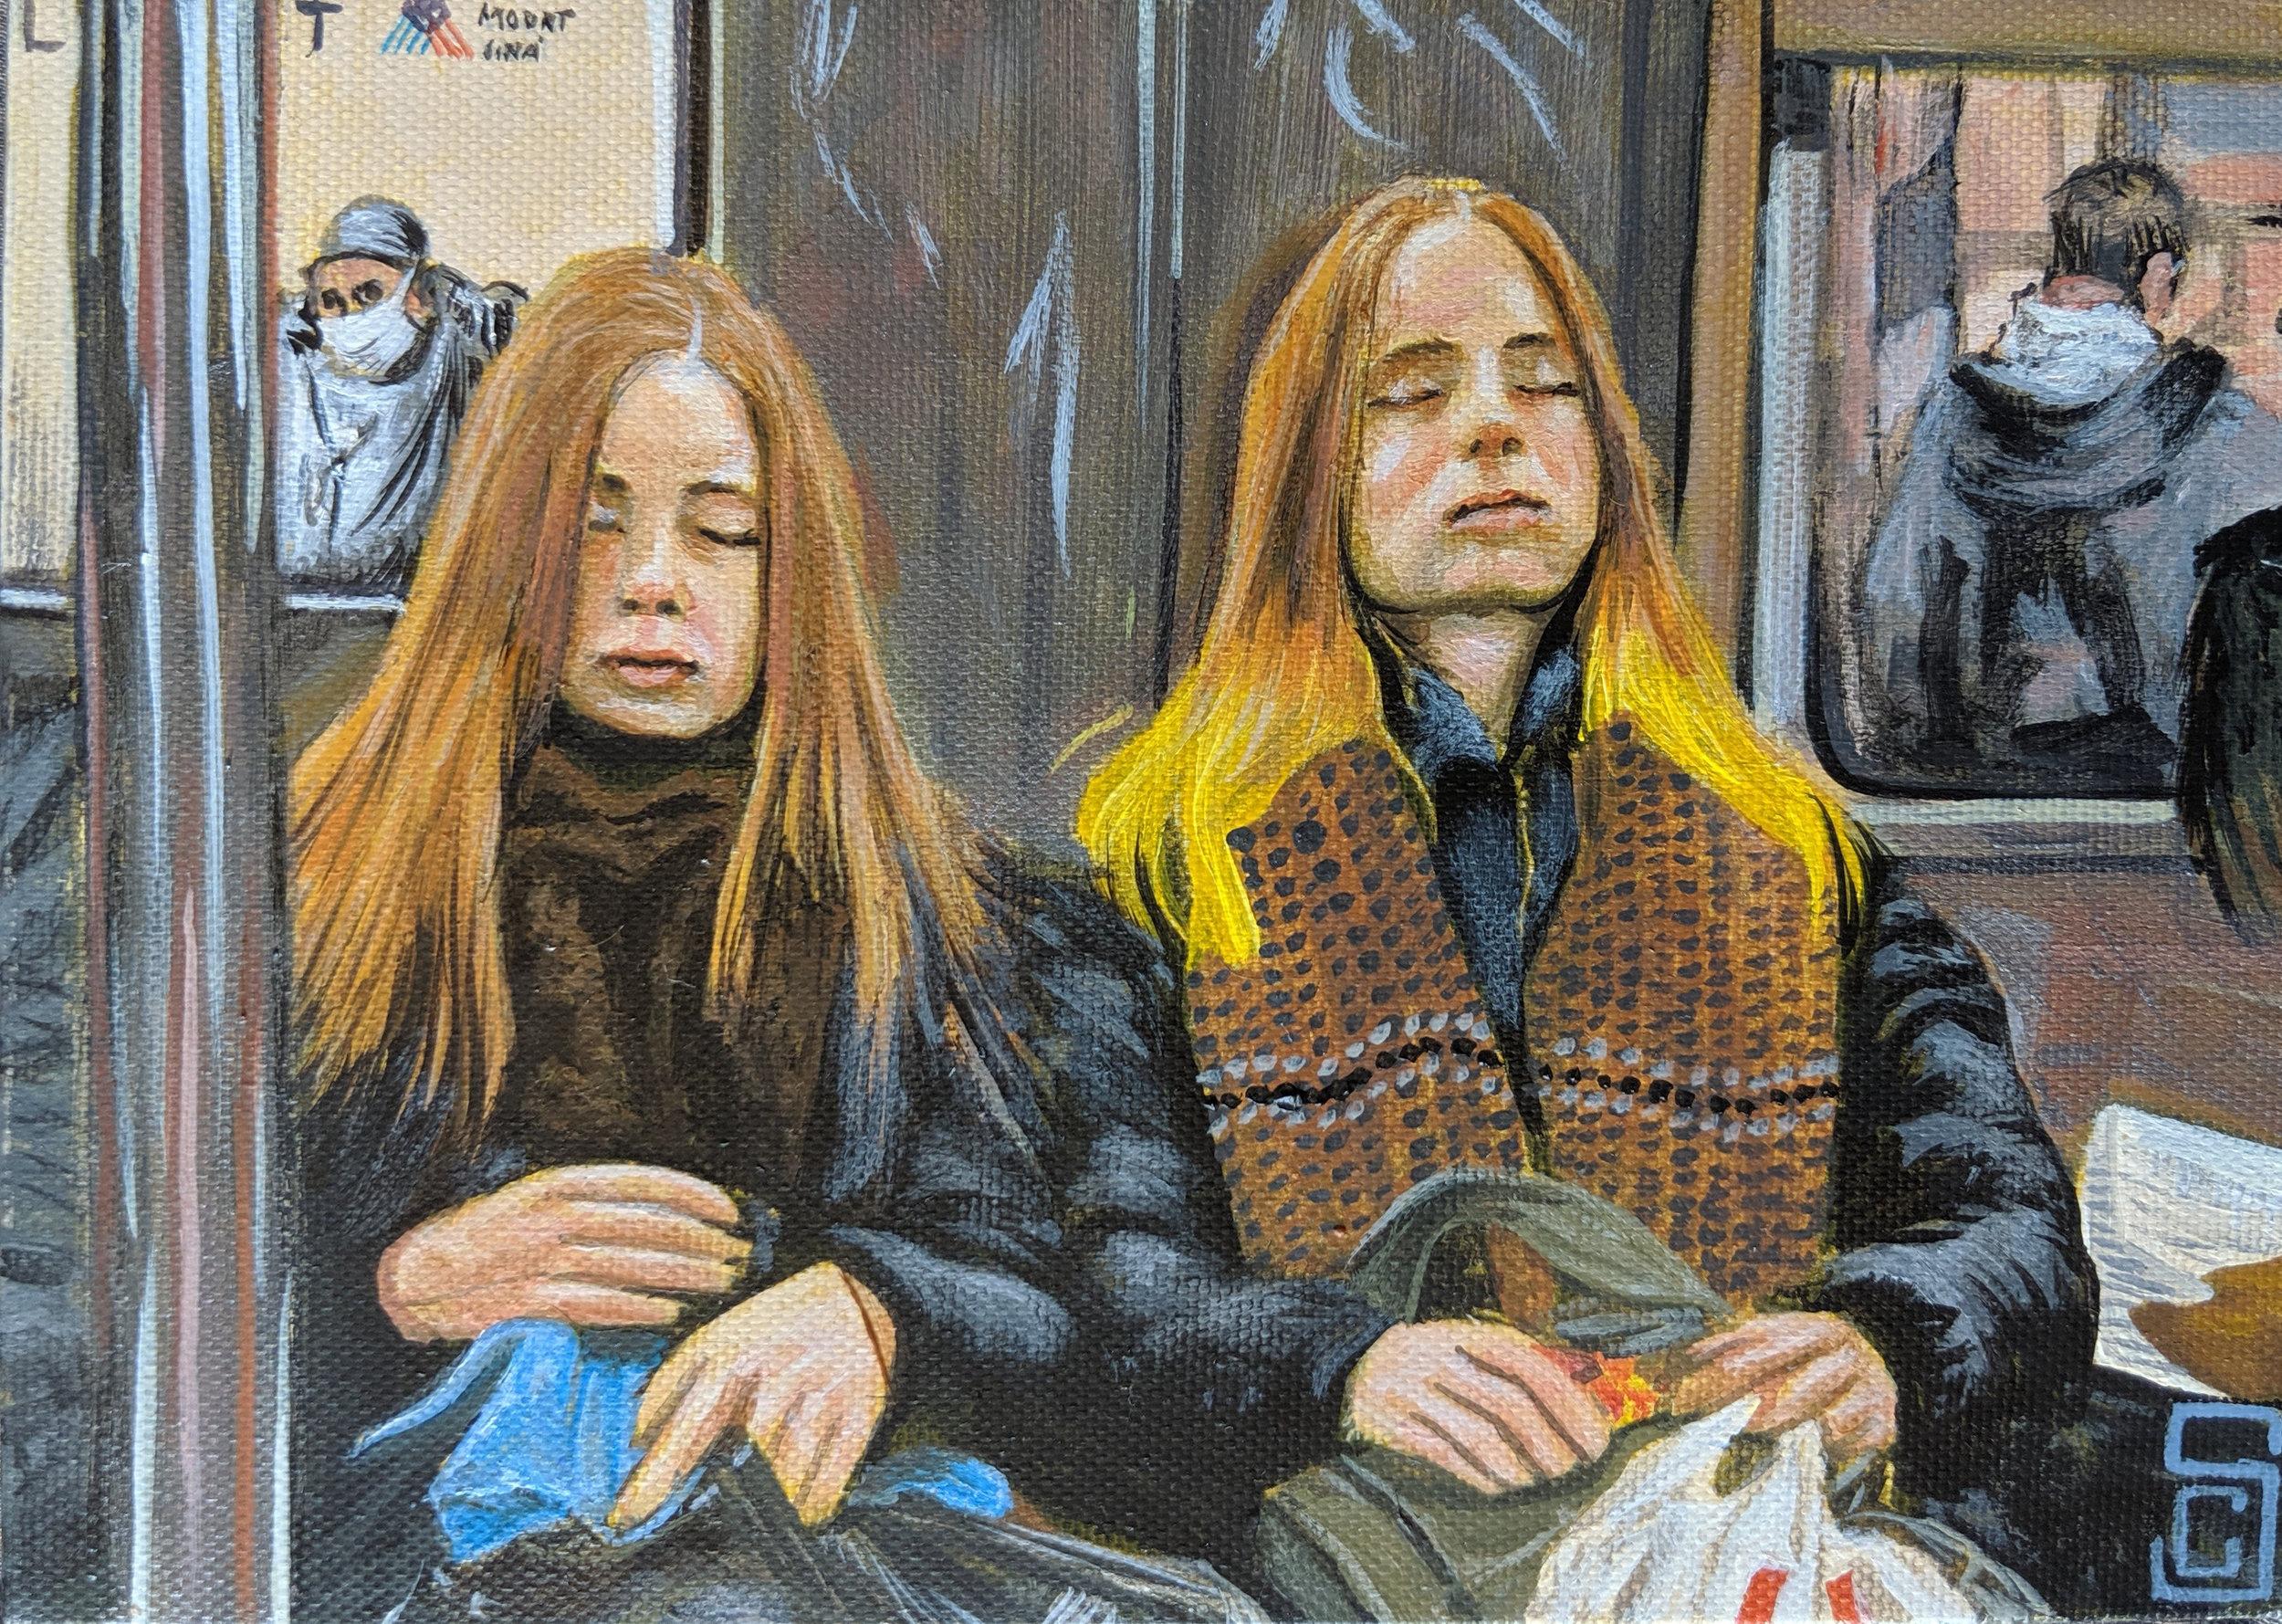 """The twins"" 5"" x 7"" Acrylic on Canvas"